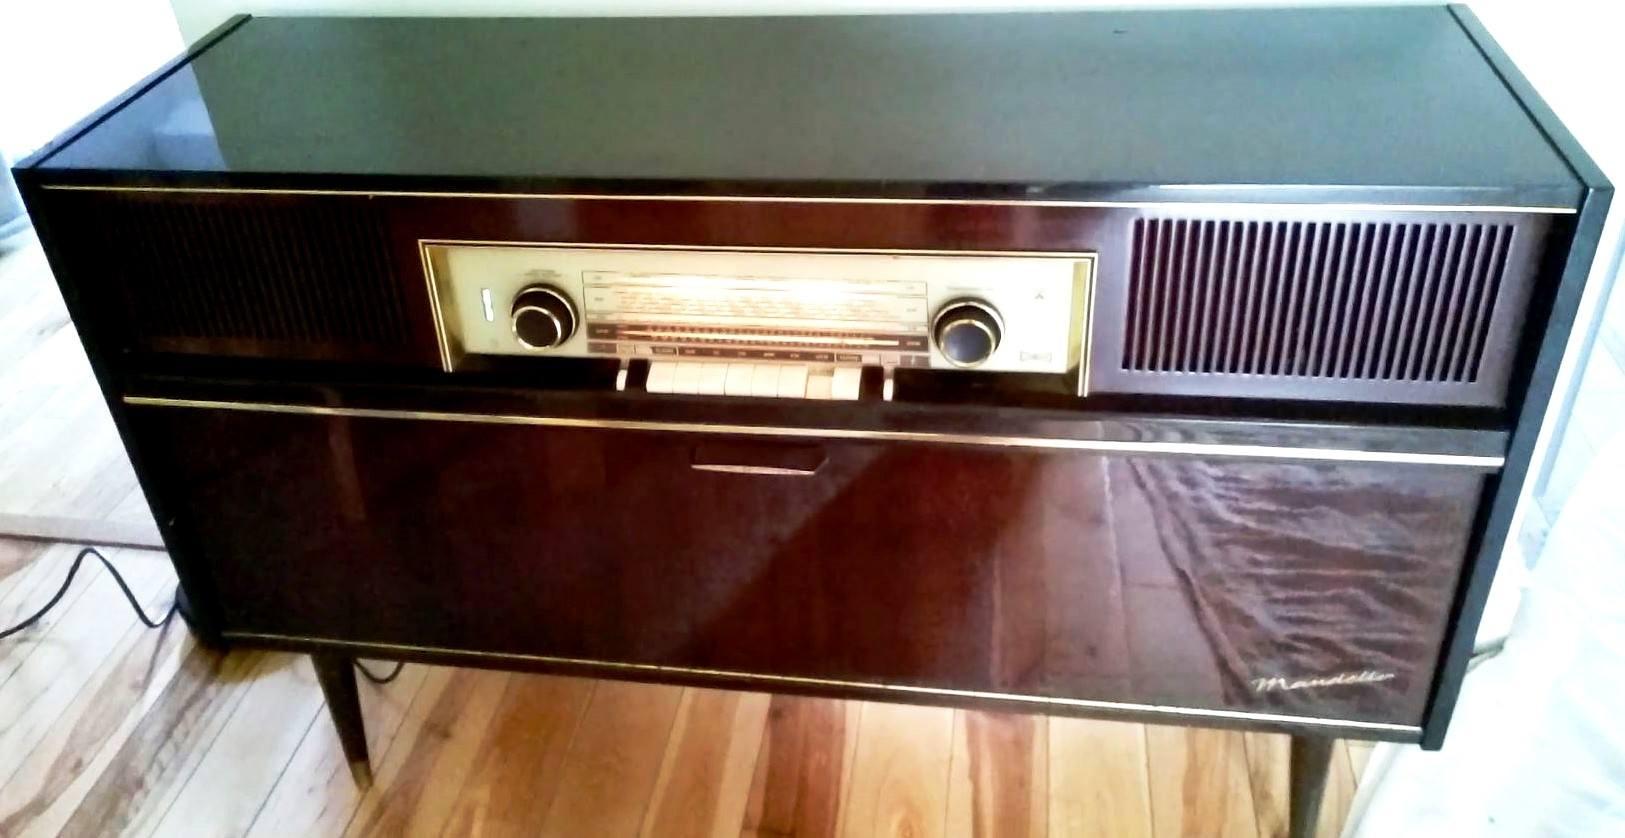 Radiogram image